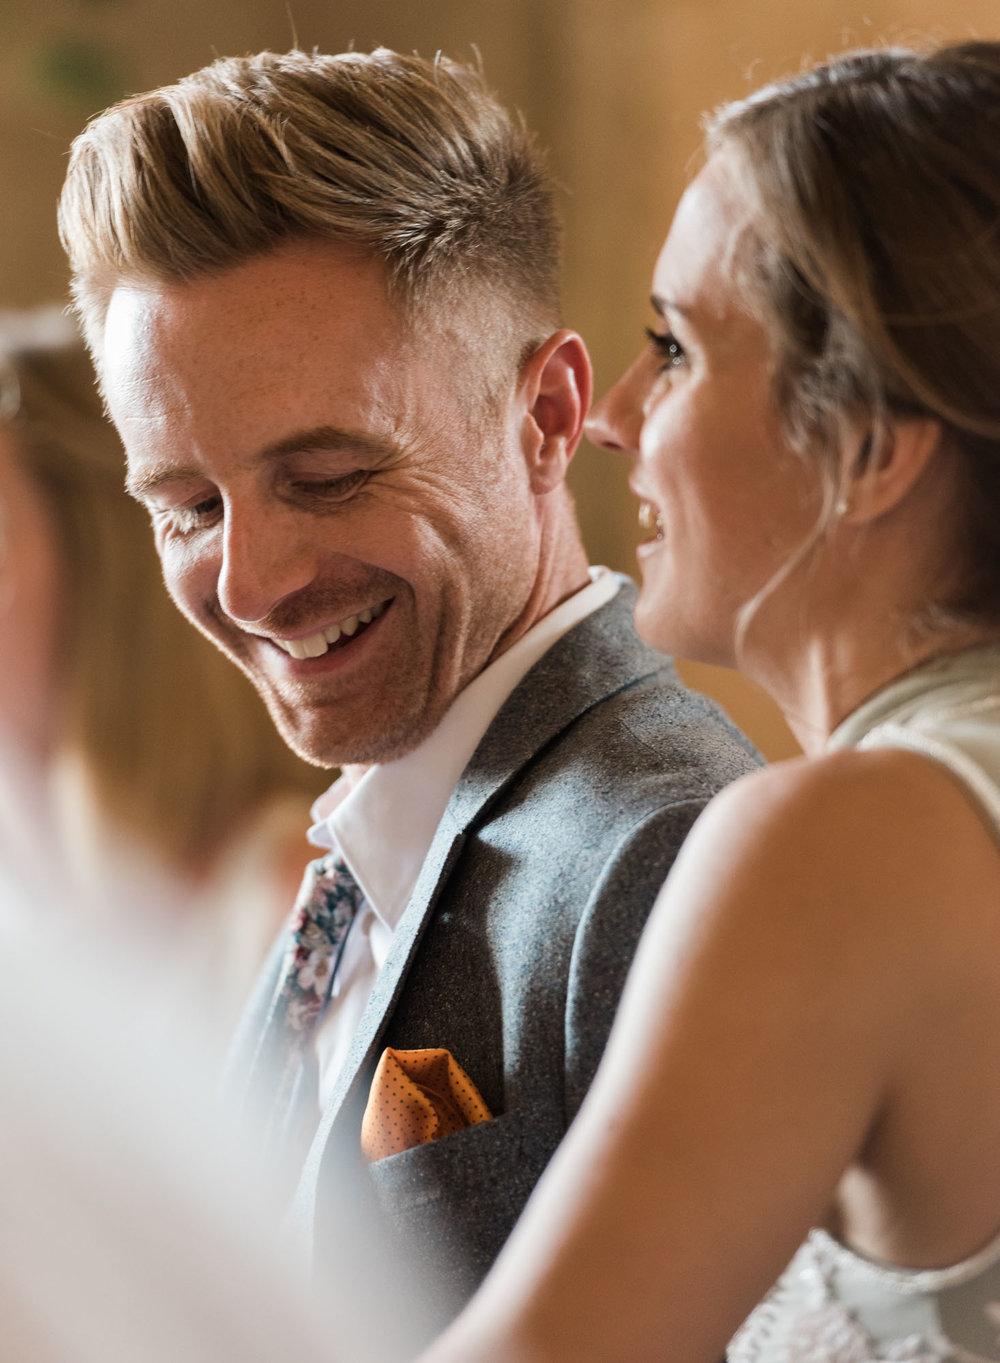 gascony_french_wedding-69.jpg